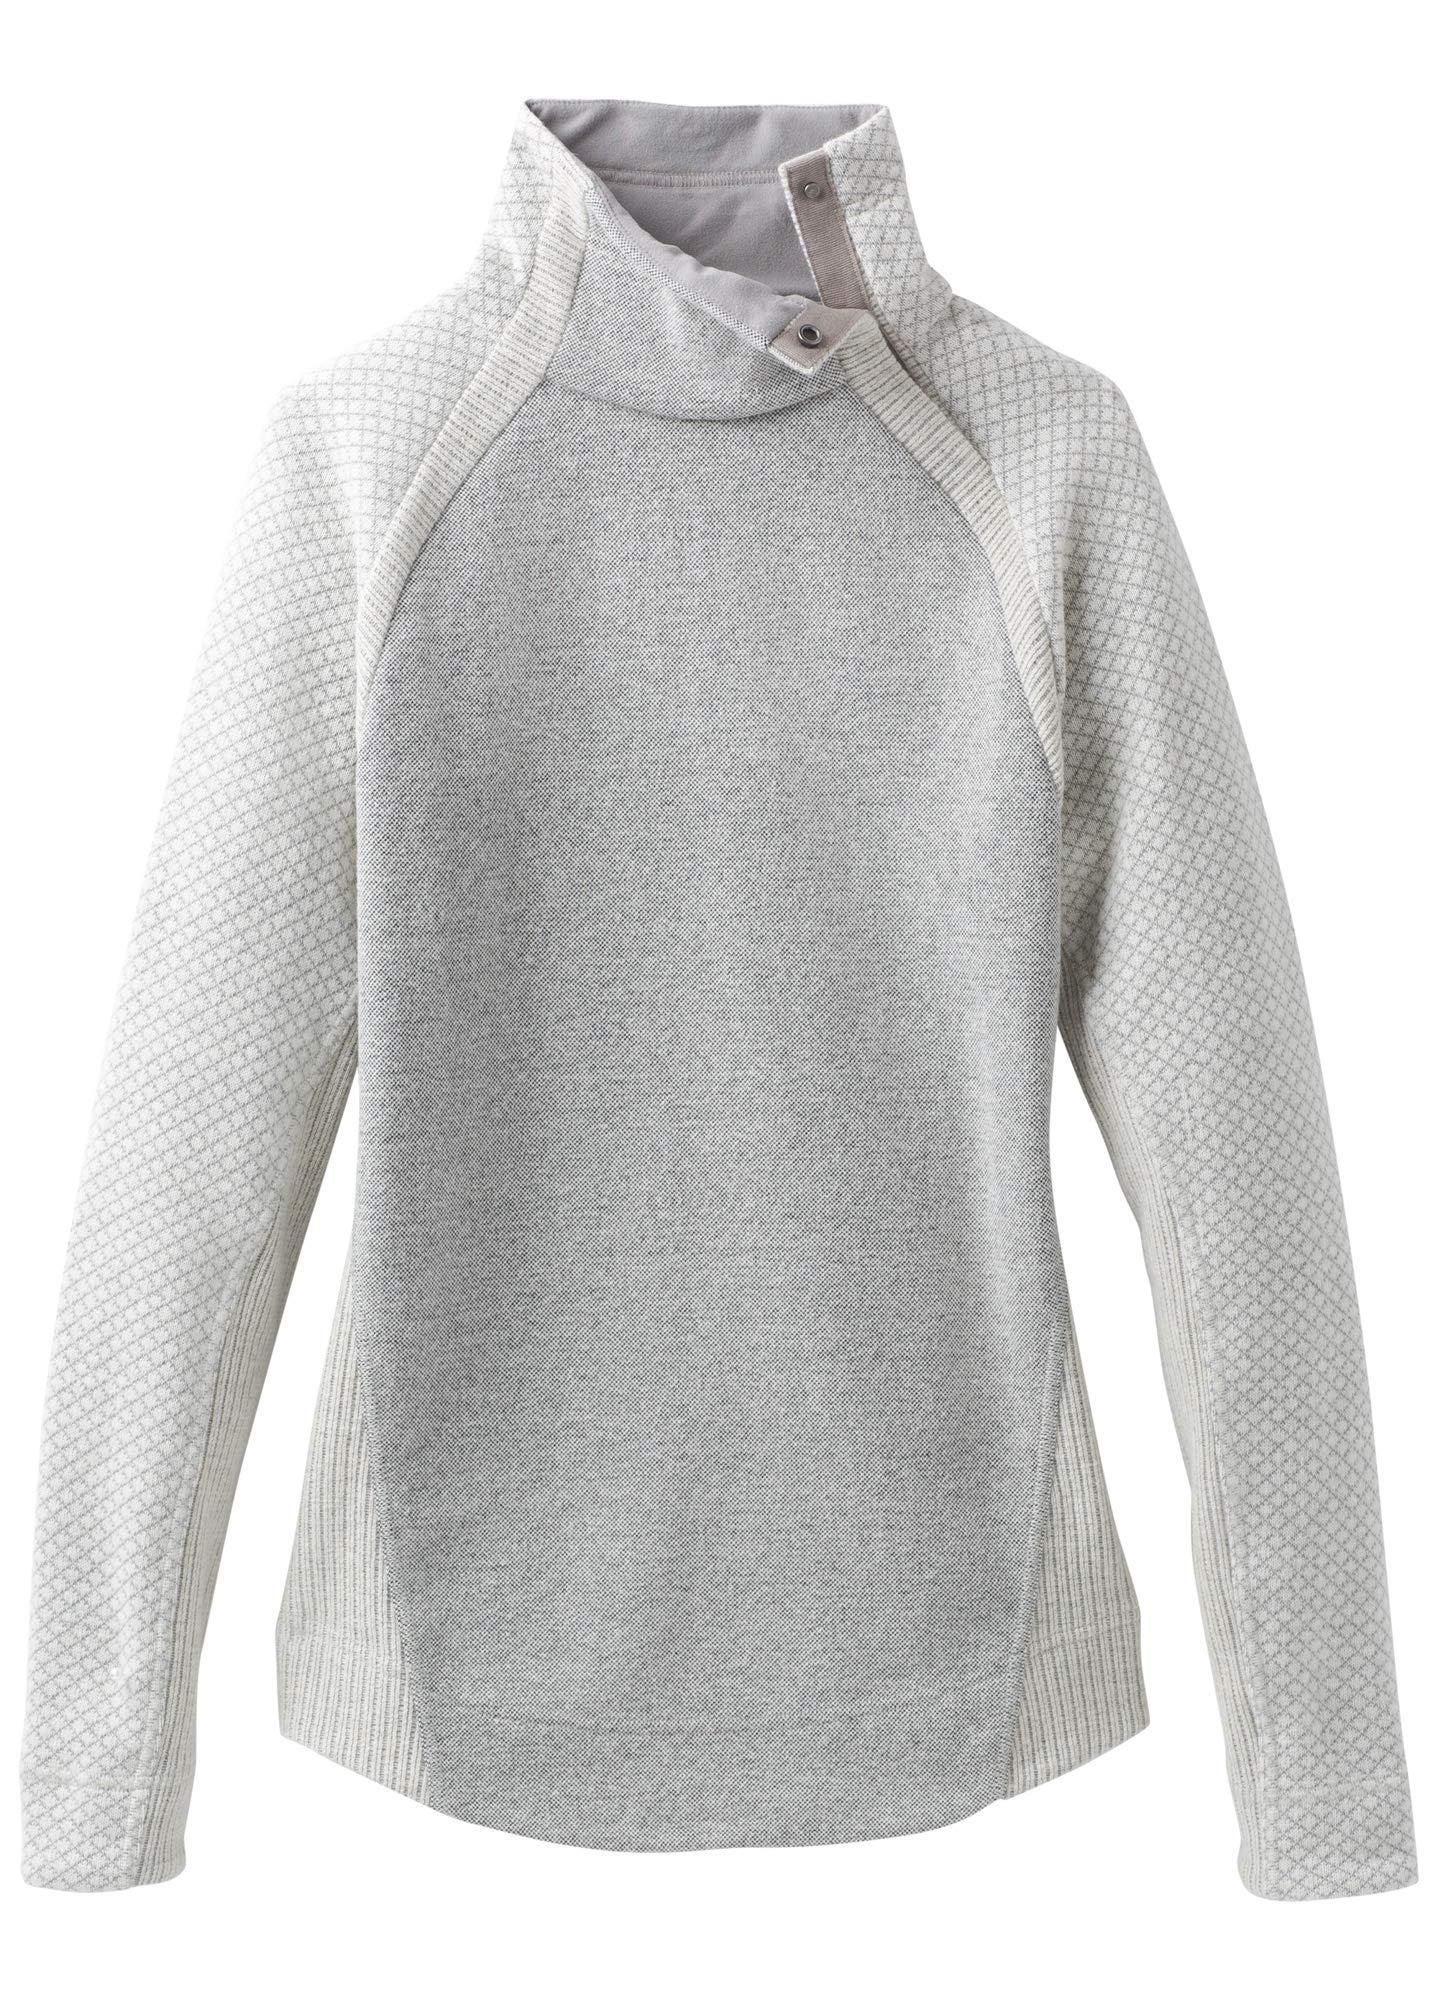 prAna Women's Brandie Sweater, Bone Heather, Large by prAna